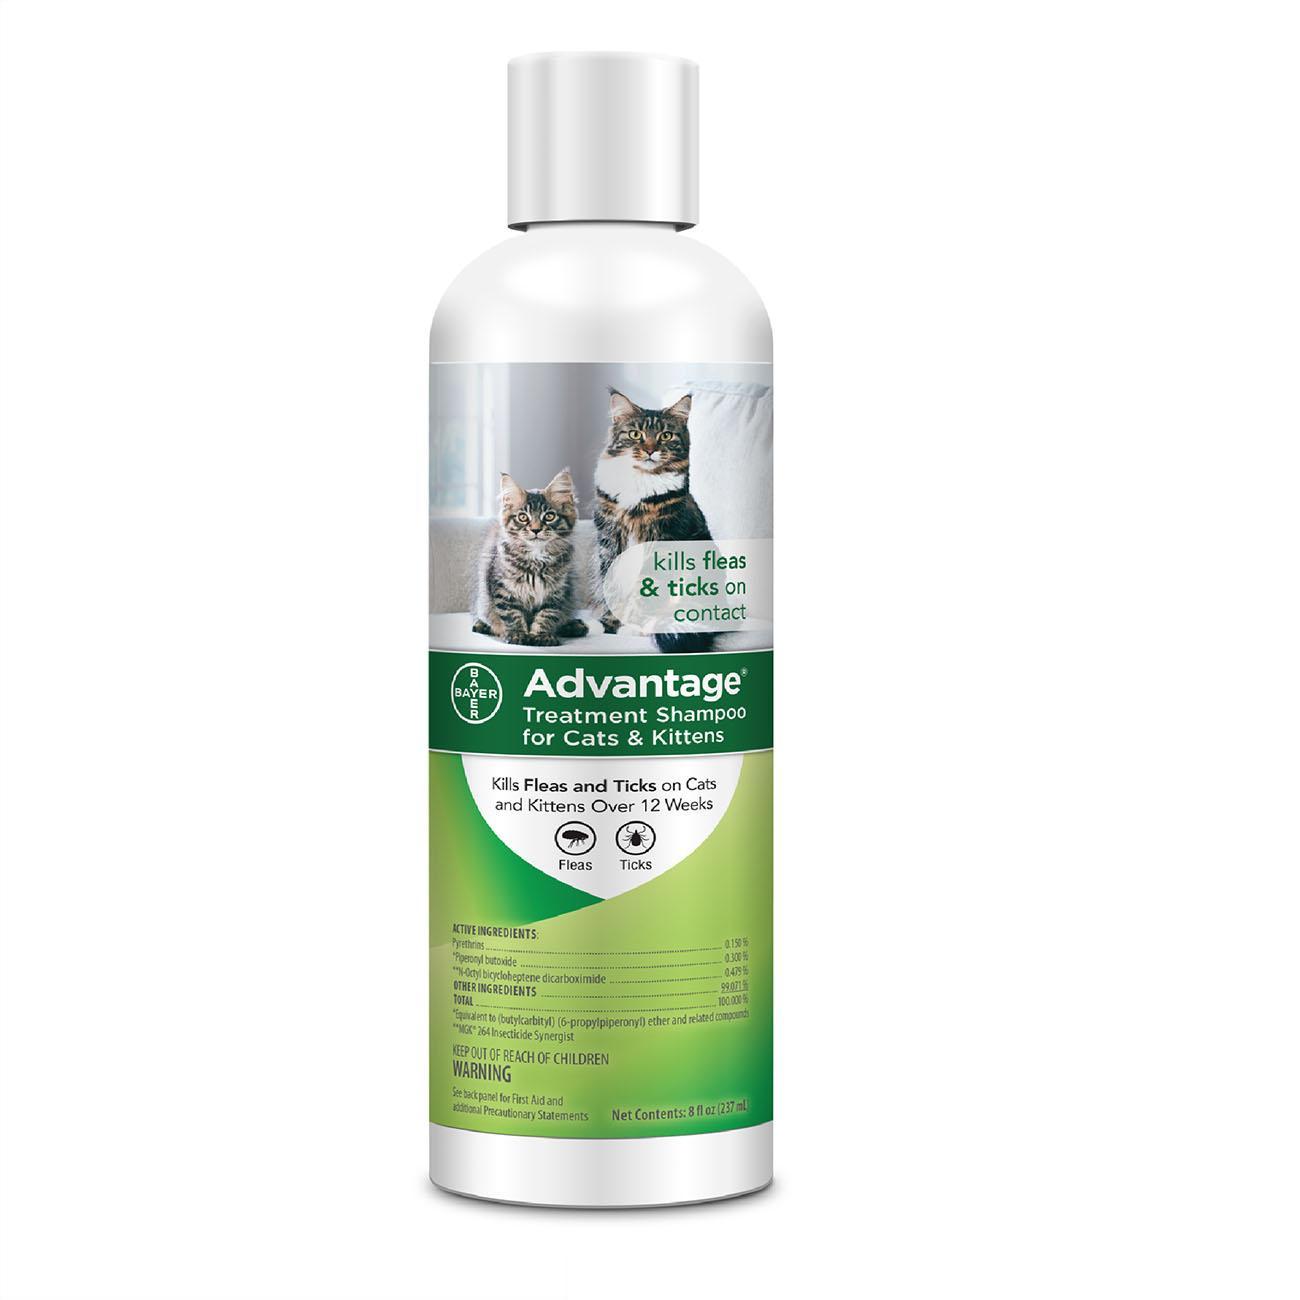 Advantage® Flea and Tick Treatment Shampoo for Cats and Kittens